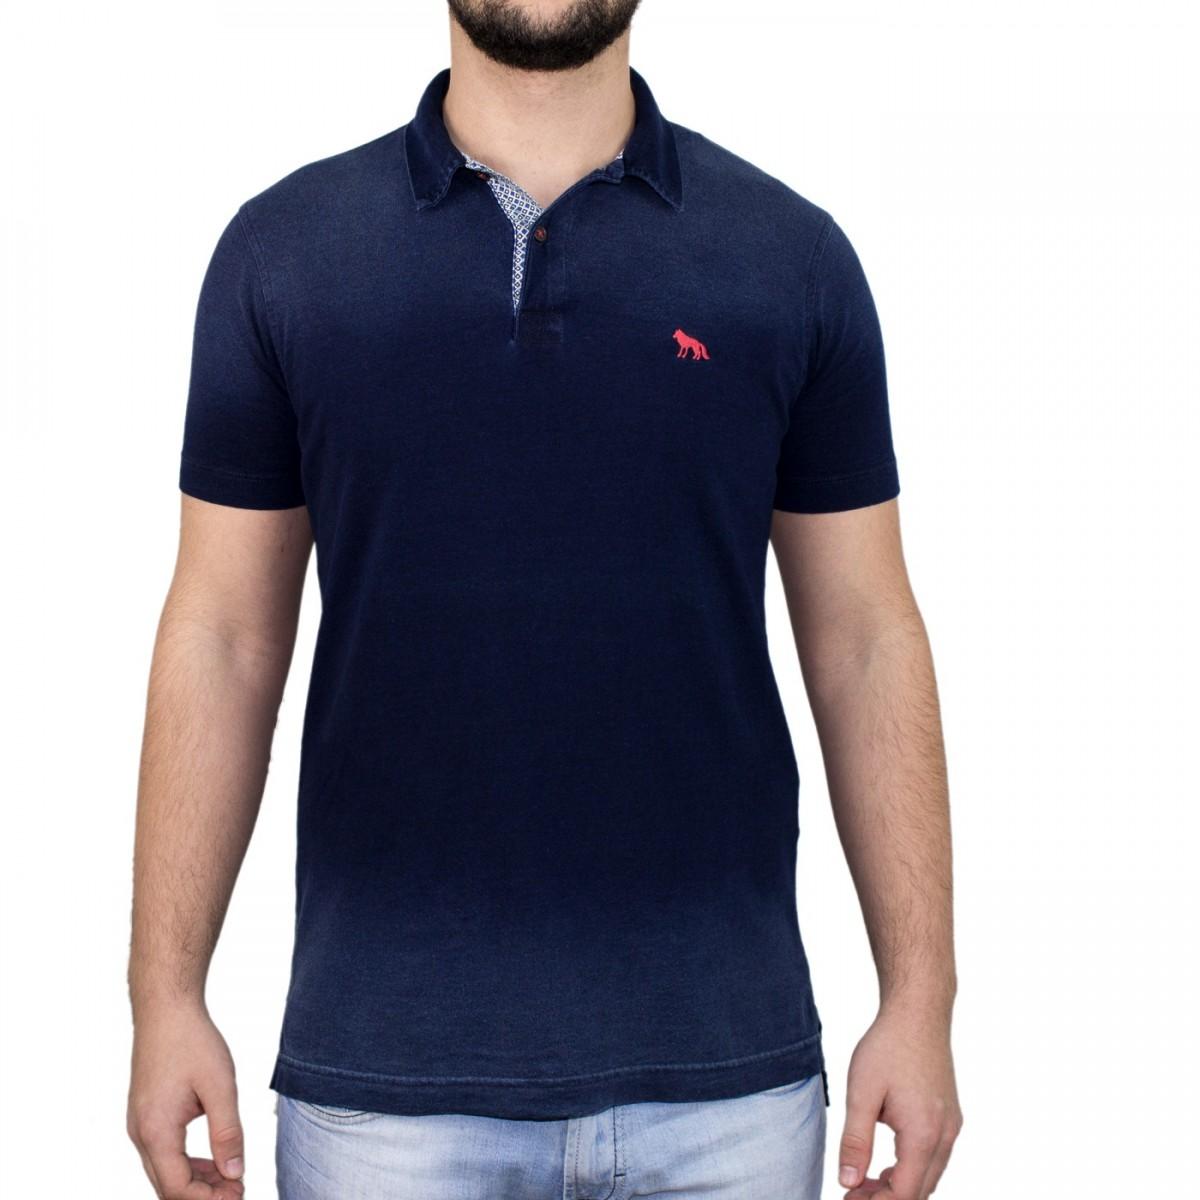 dfa0b7503 Bizz Store - Camisa Polo Masculina Acostamento Marinho Manga Curta